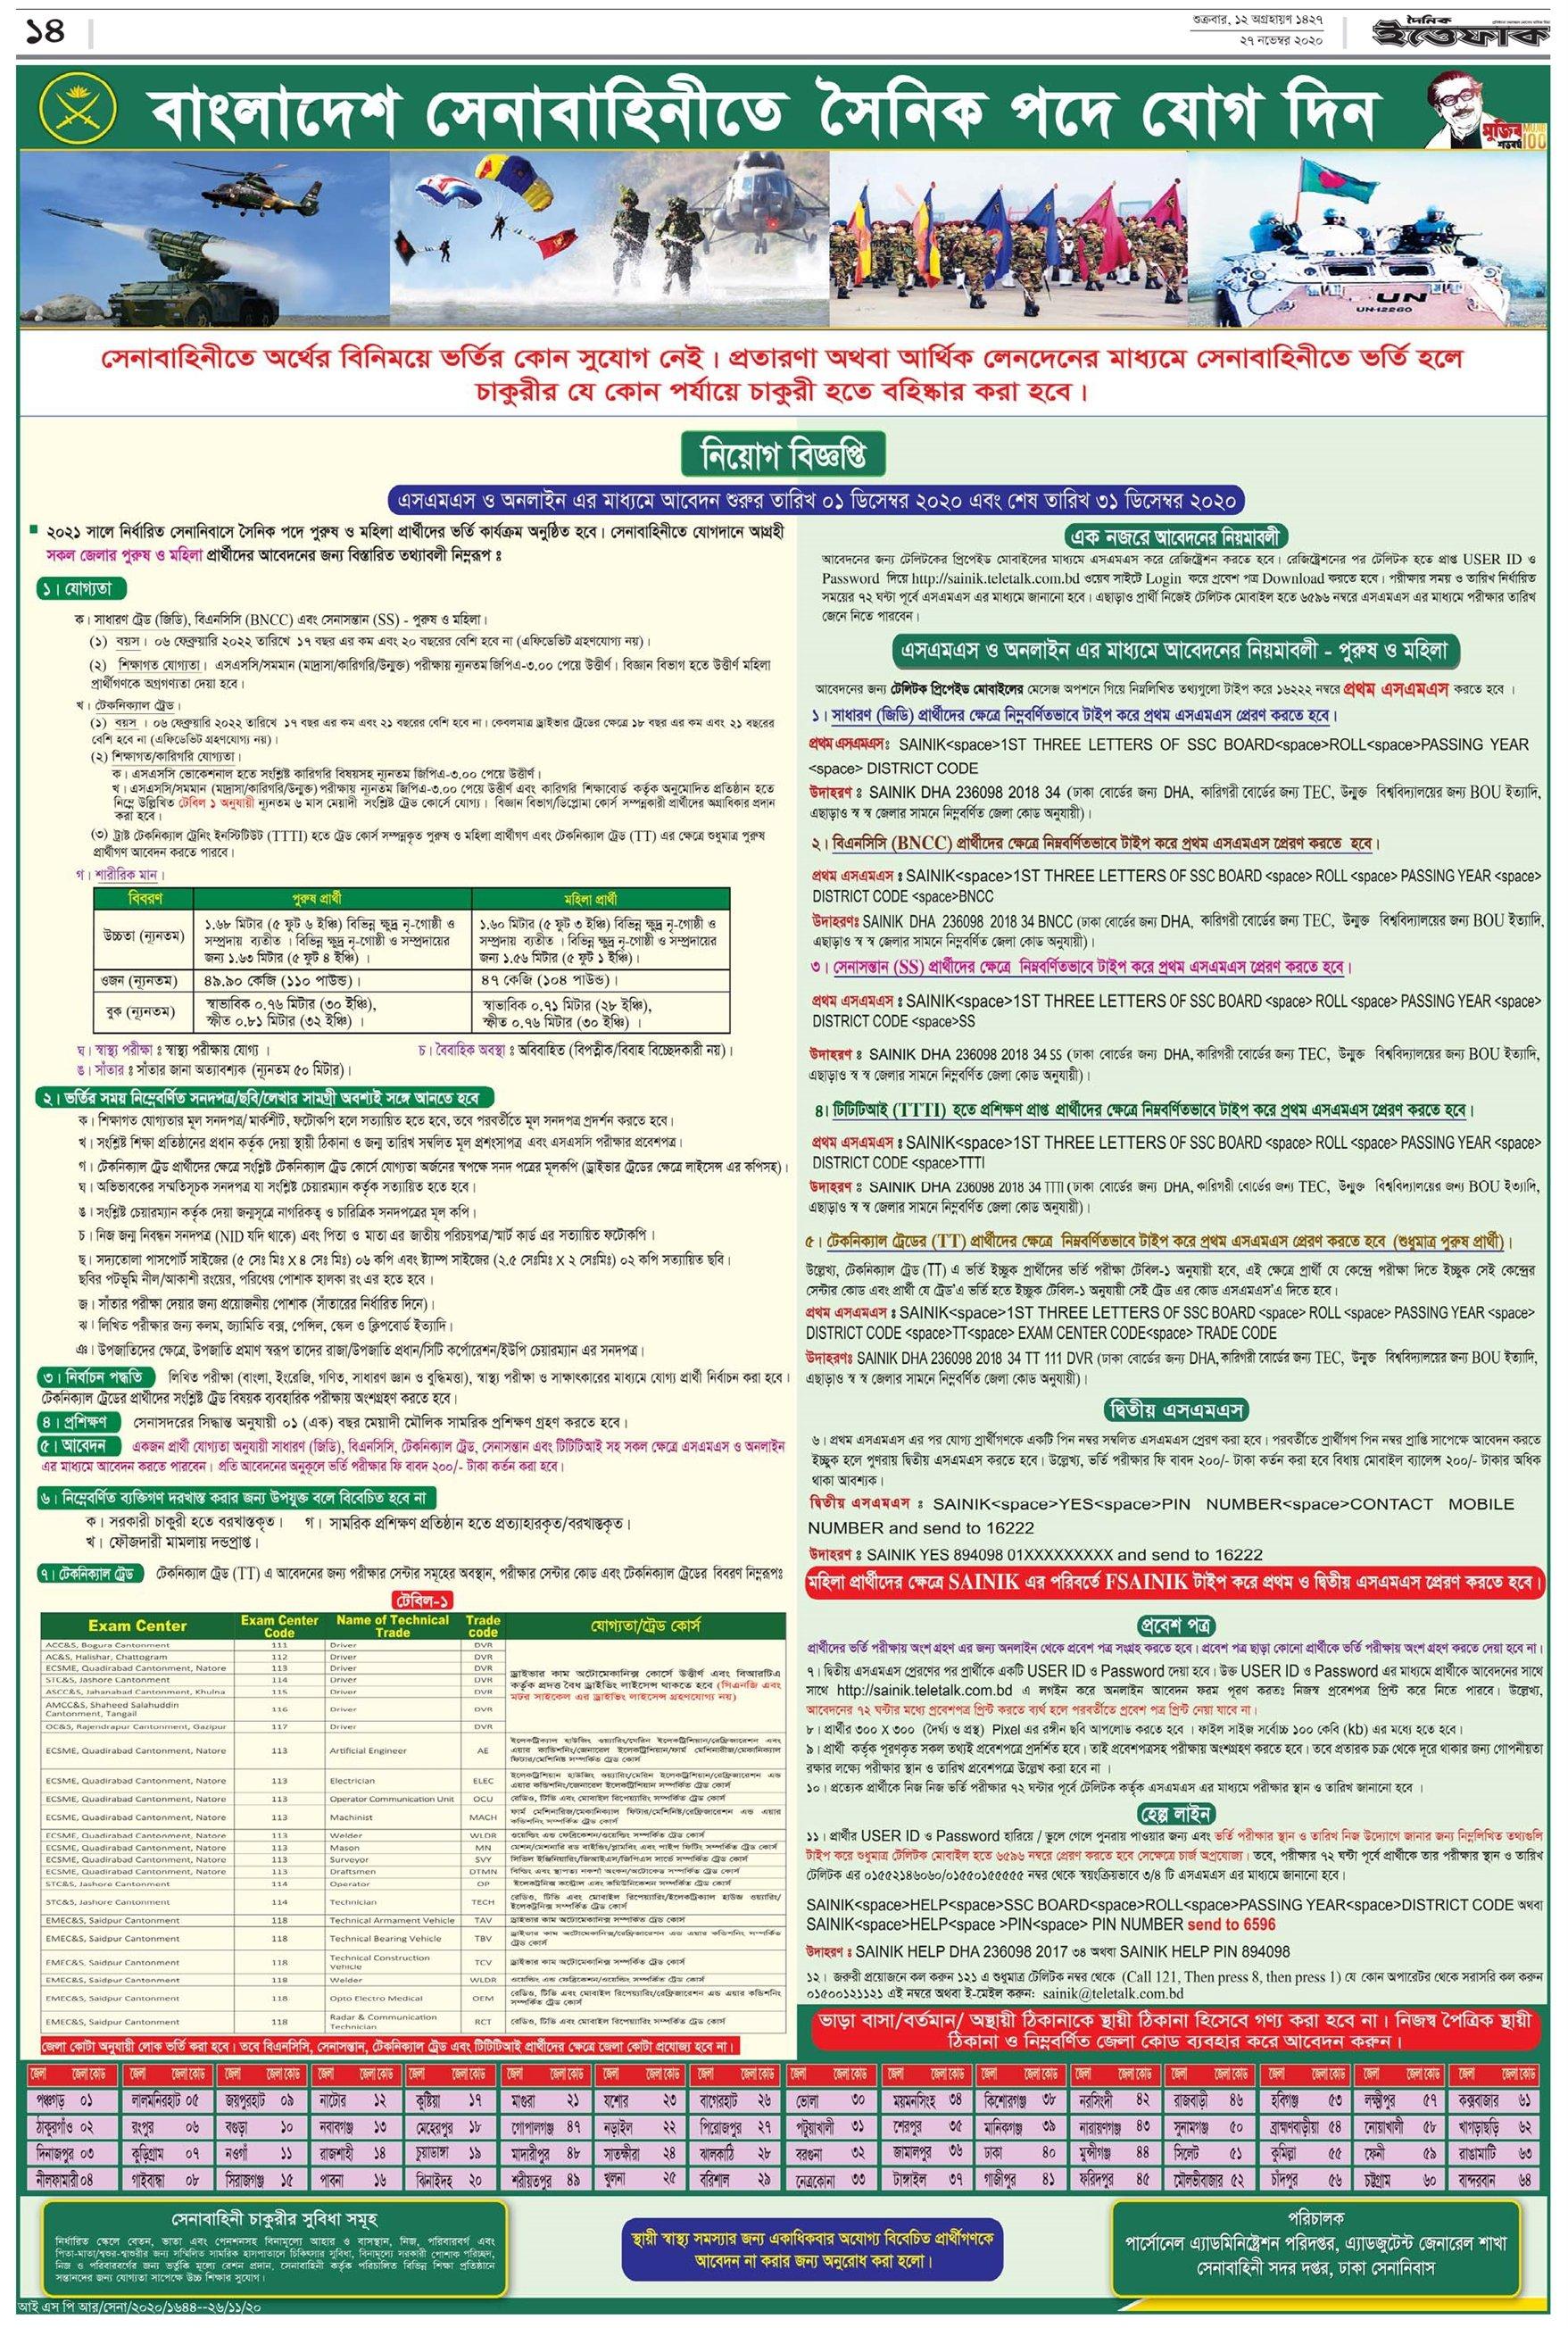 Bangladesh Army Sainik Job Circular 2020